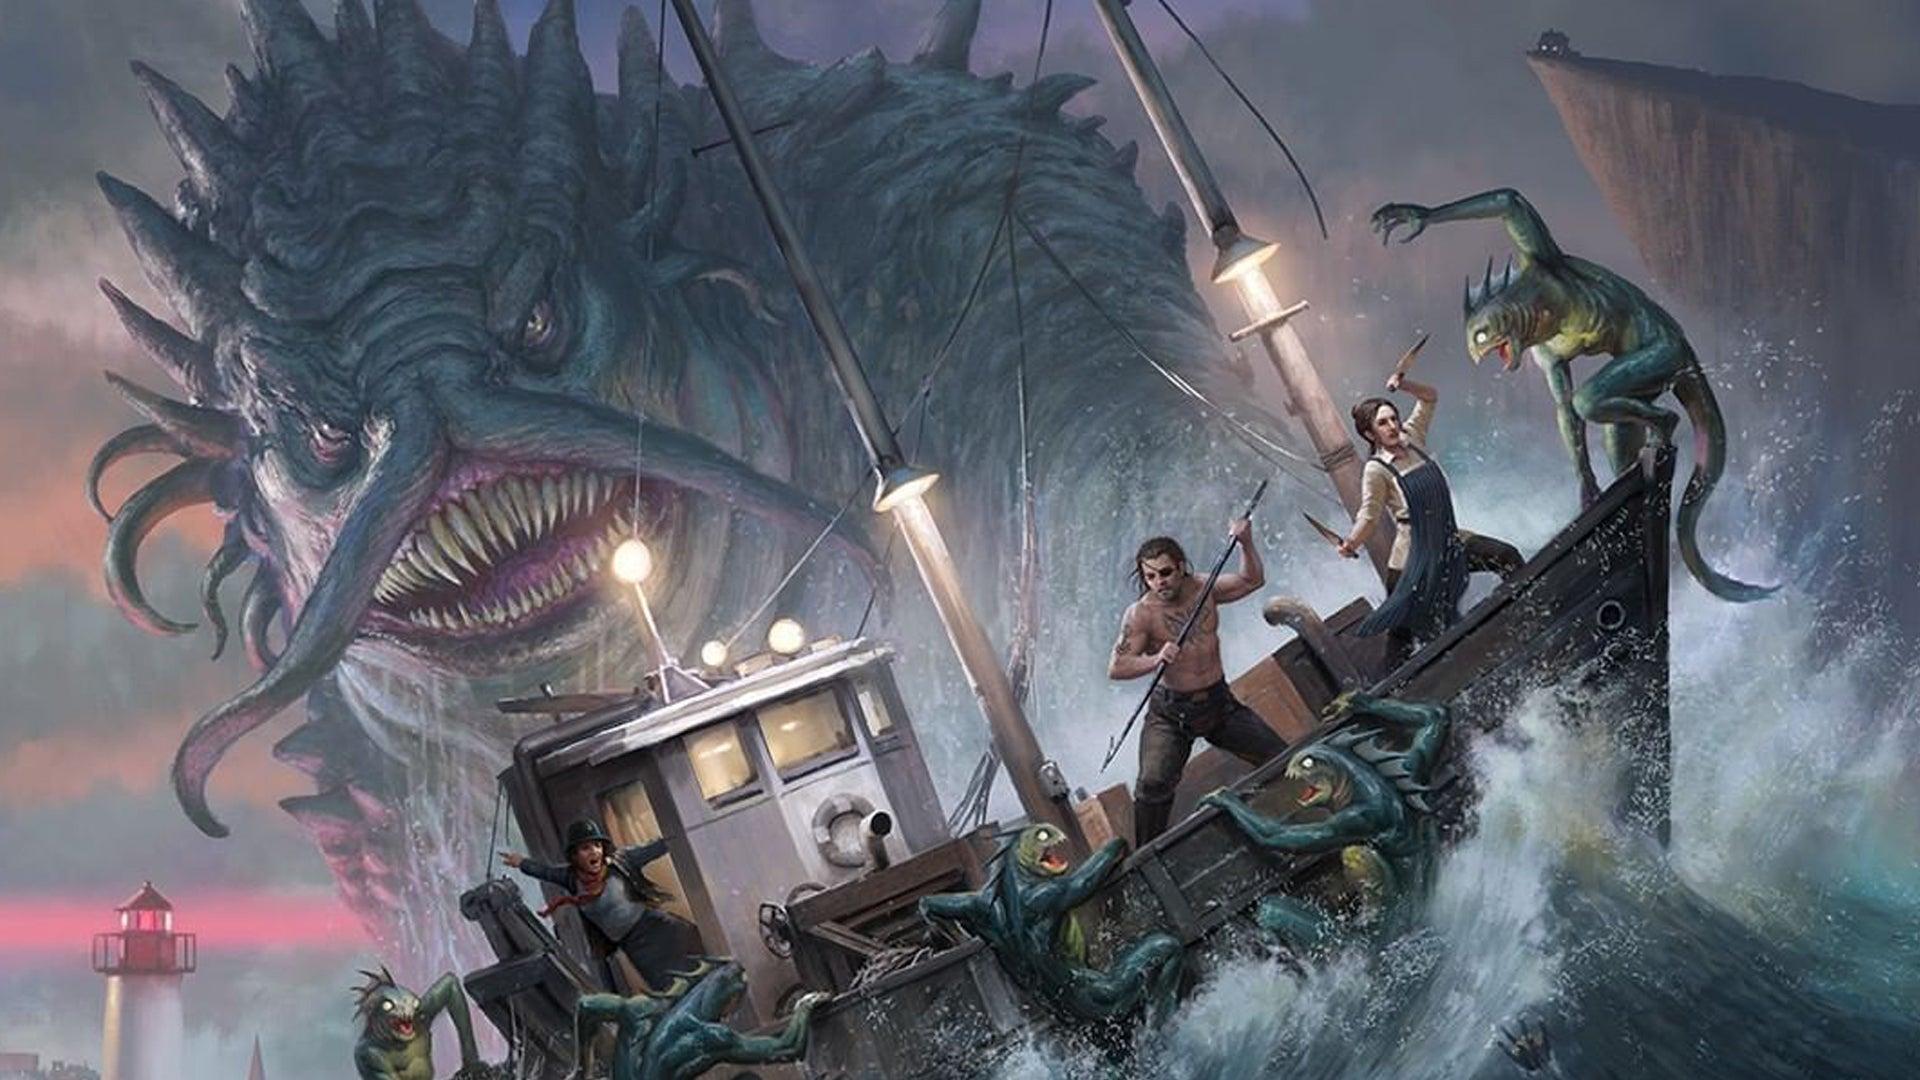 arkham-horror-3e-under-dark-waters-art.jpg